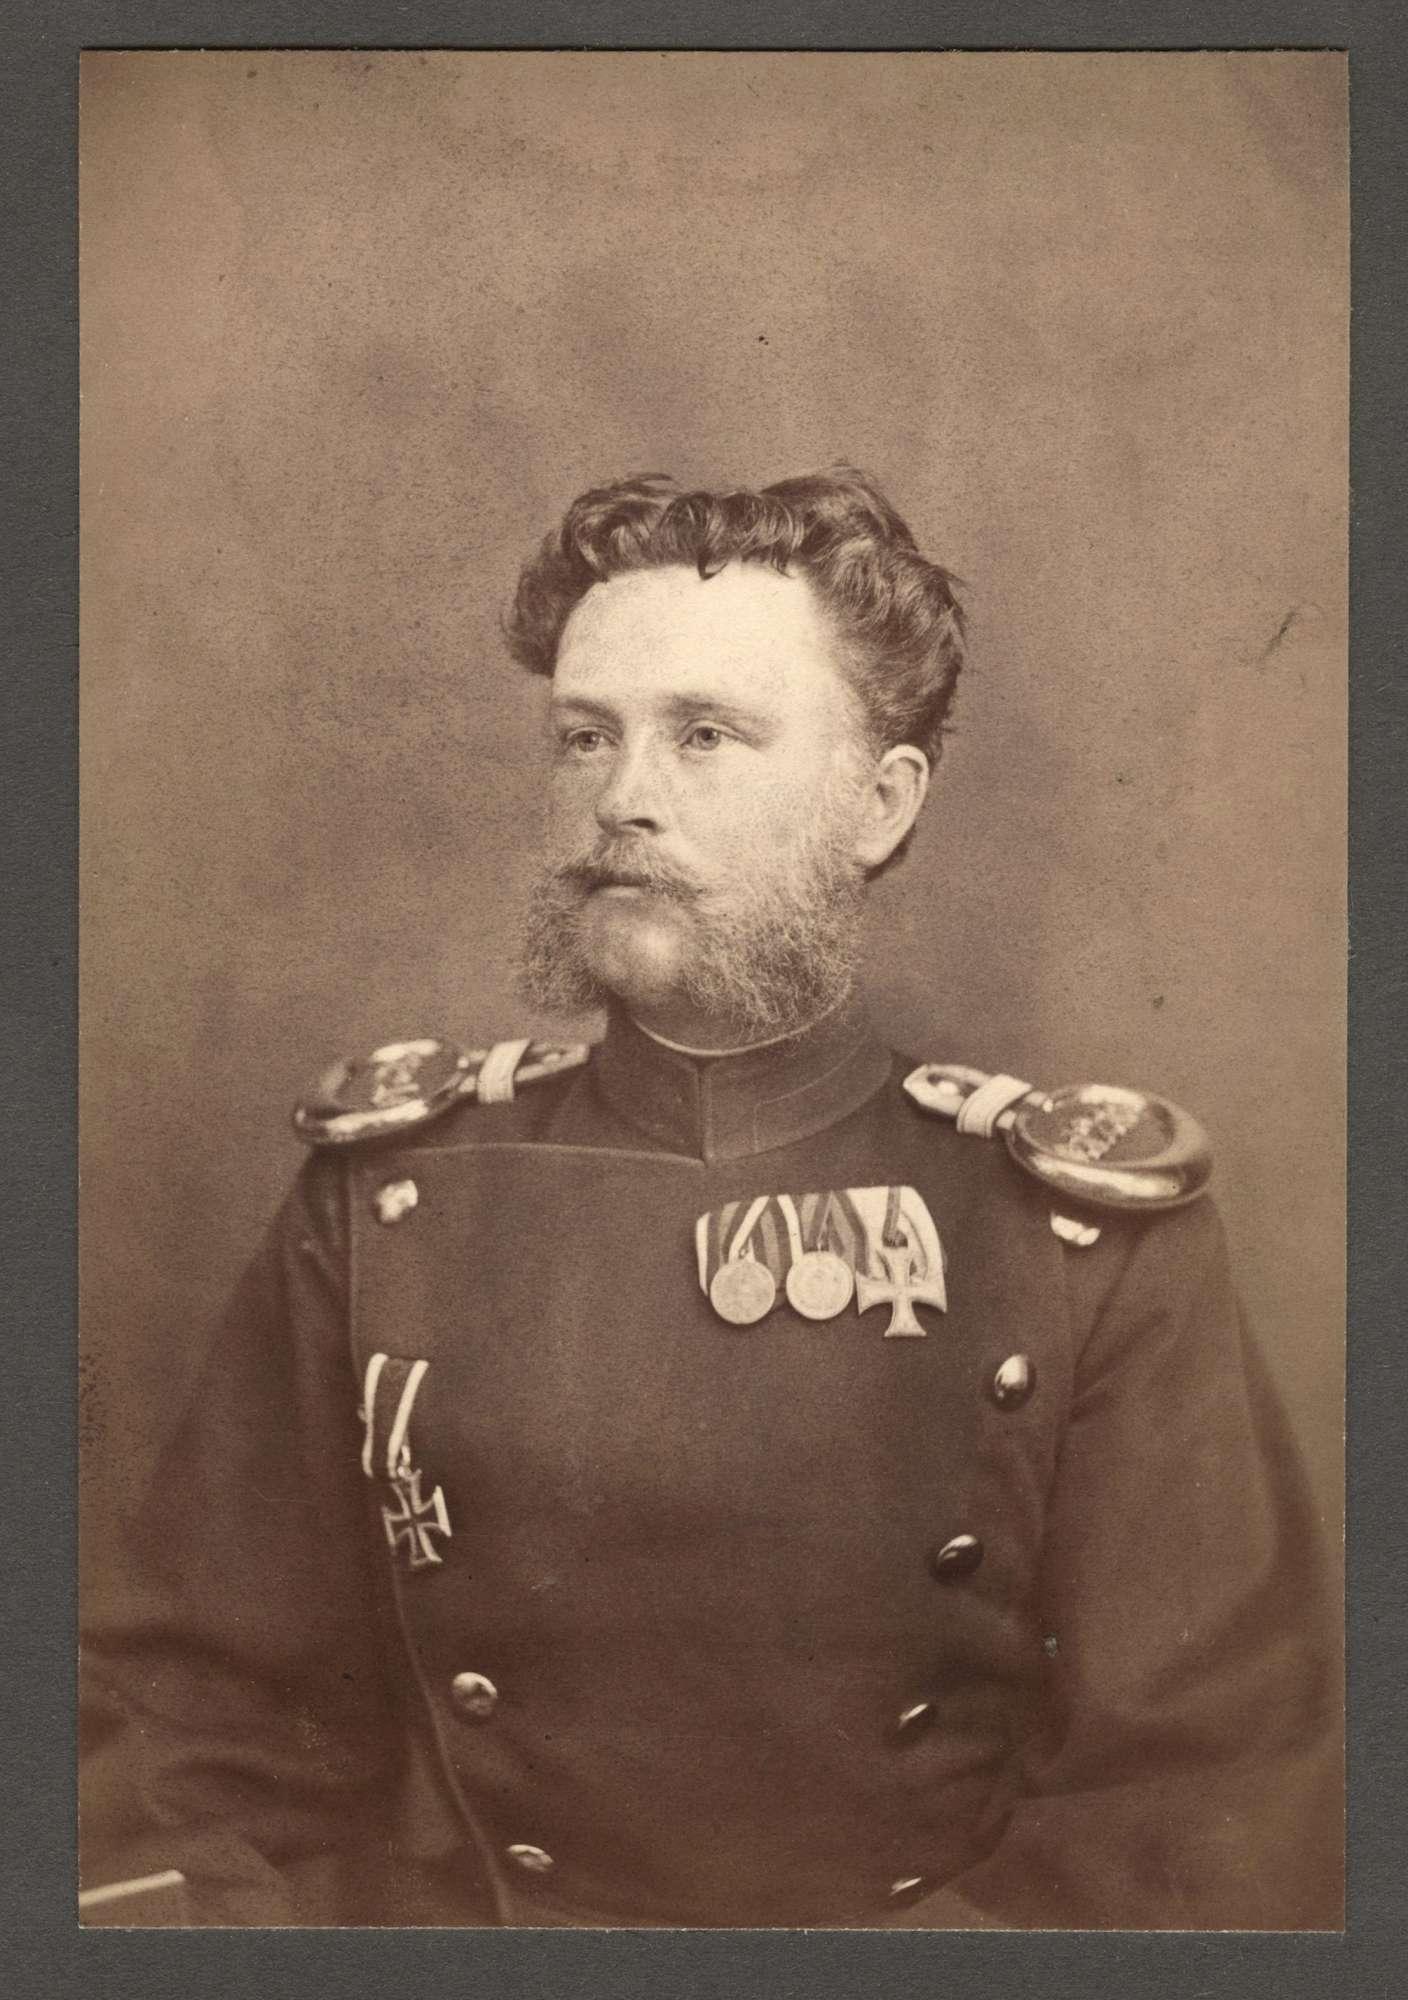 Goez, Oskar von, Bild 2